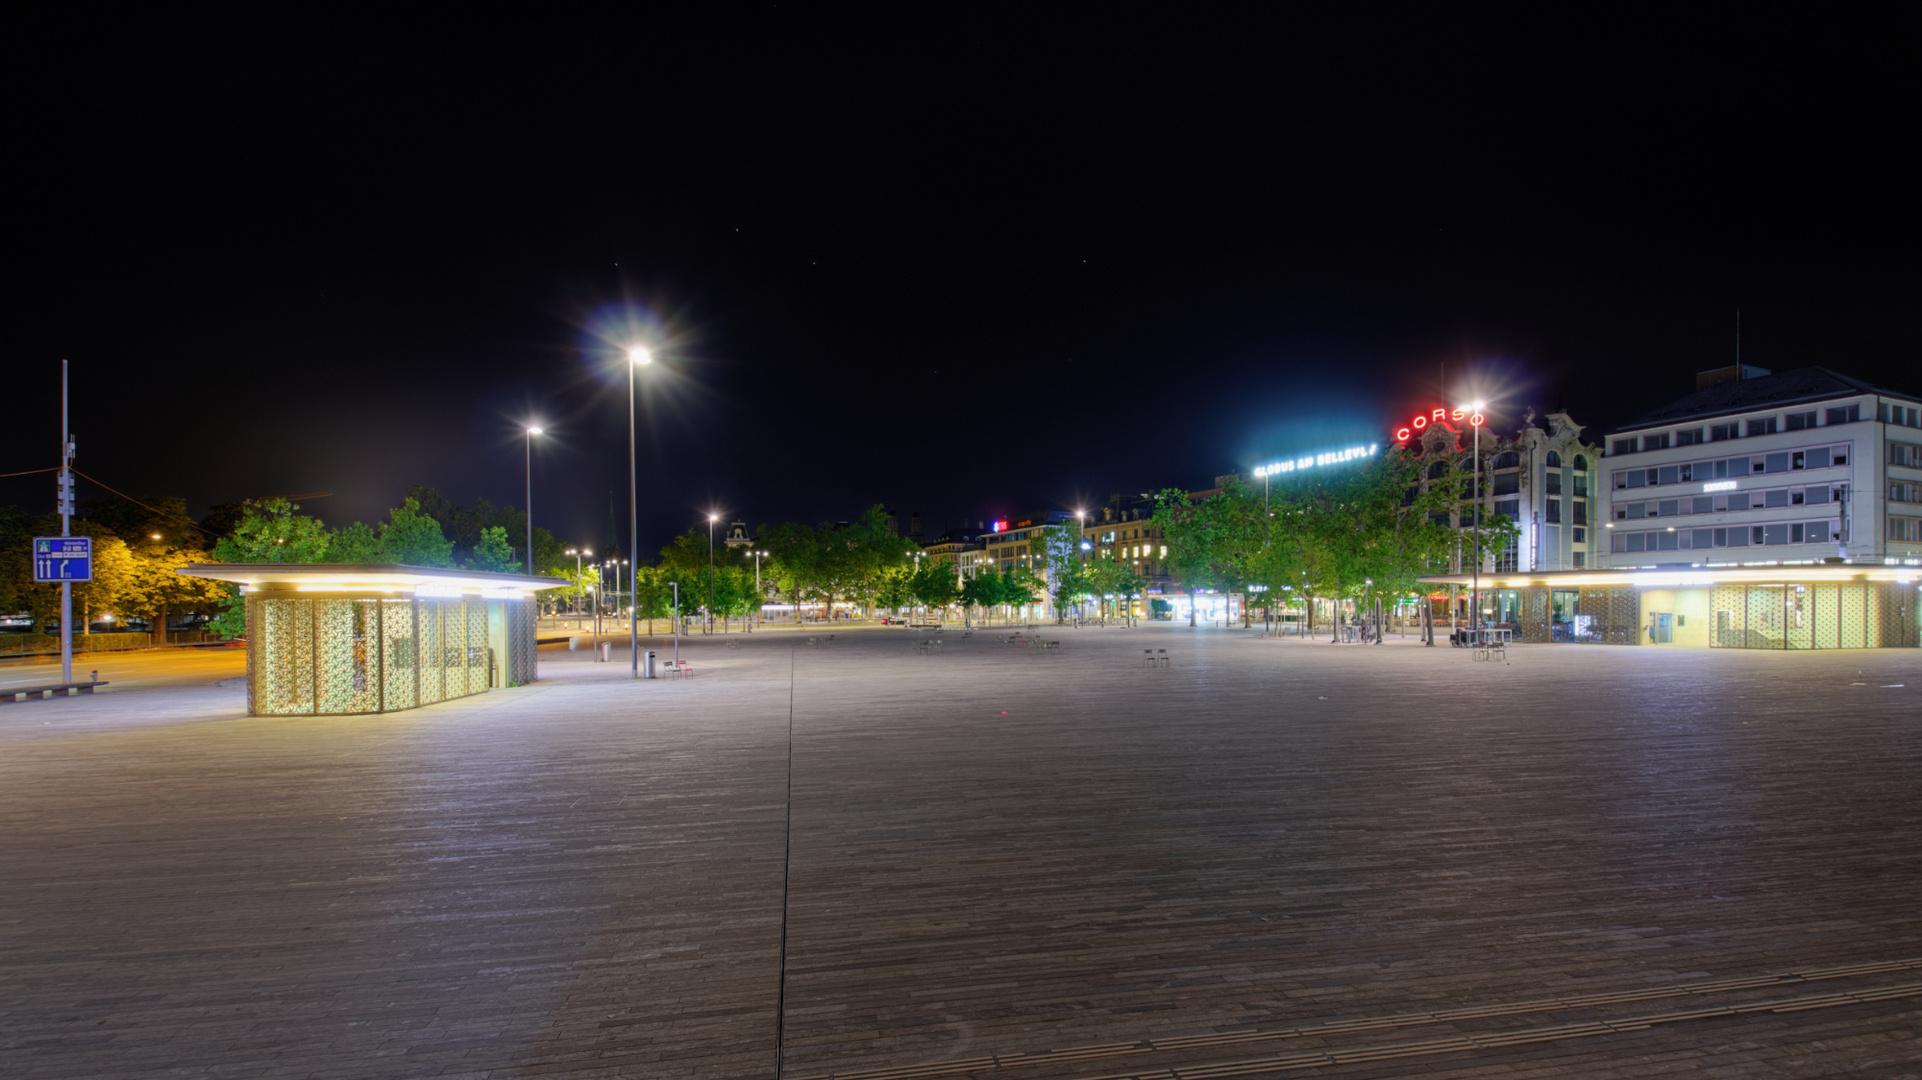 Sechselaeutenplatz @ night